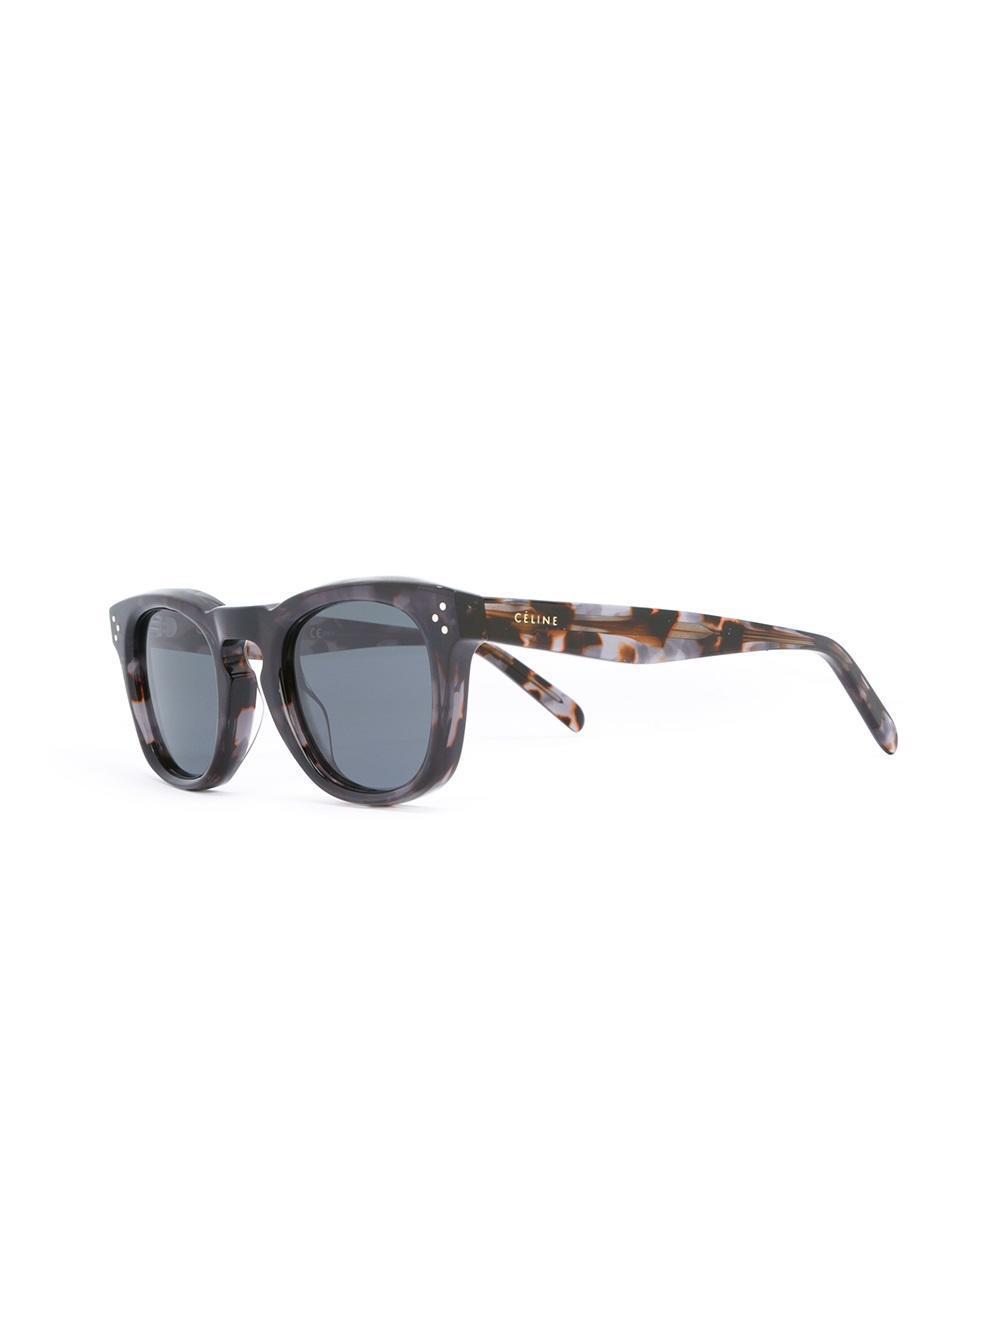 e9f696cc66a13 Céline  bevel Square  Sunglasses in Brown - Lyst